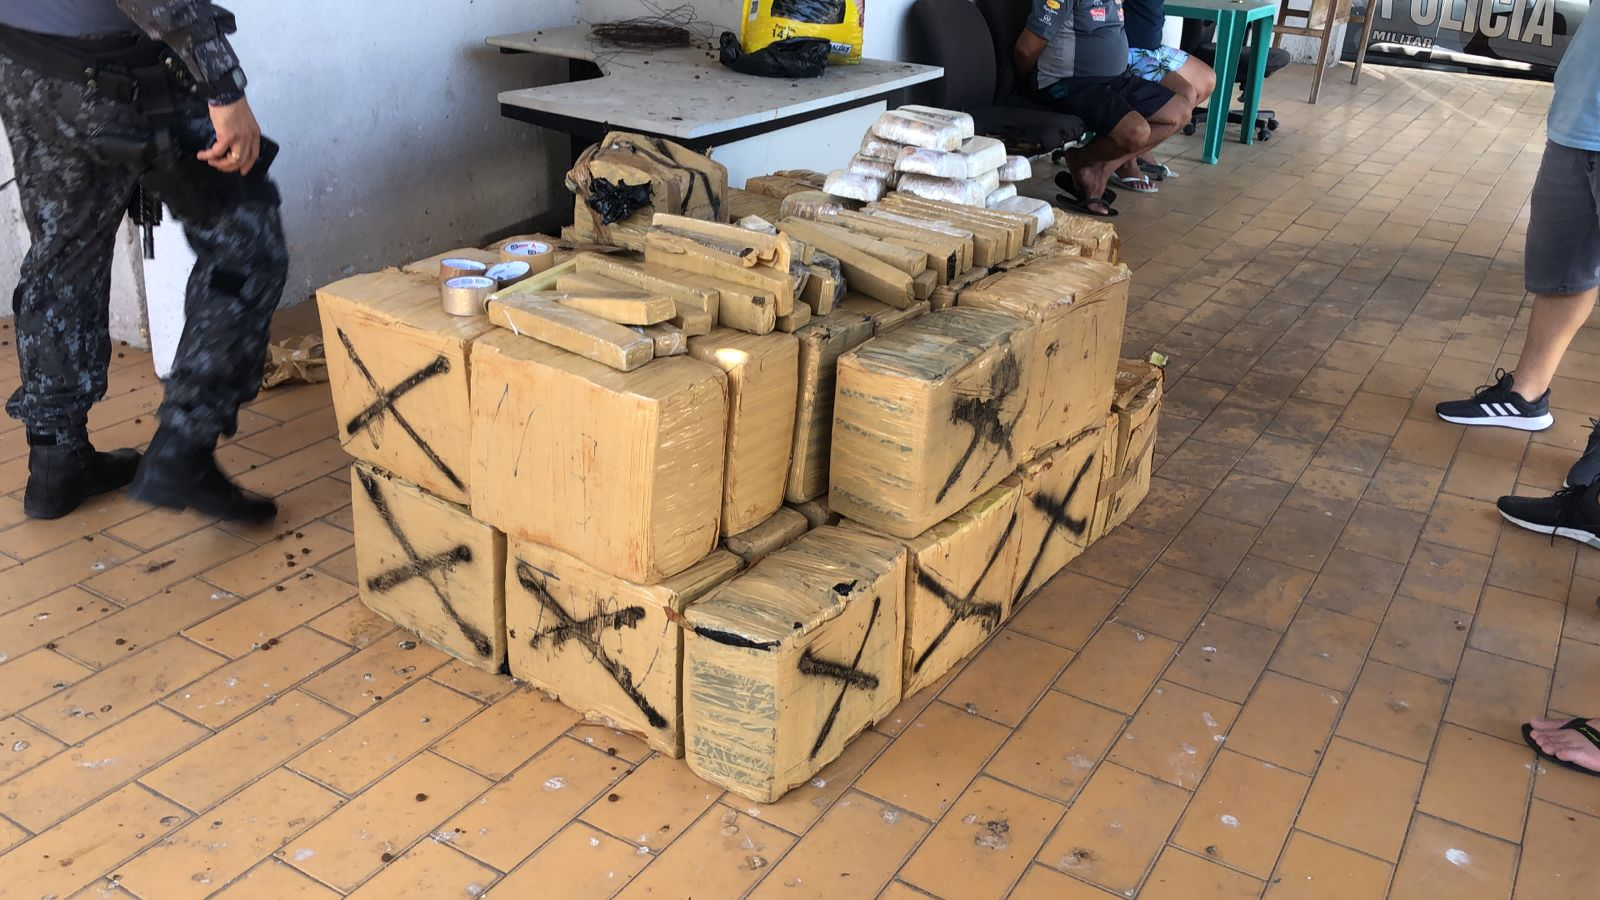 PMCE apreende quase 800kg de drogas no bairro Parangaba